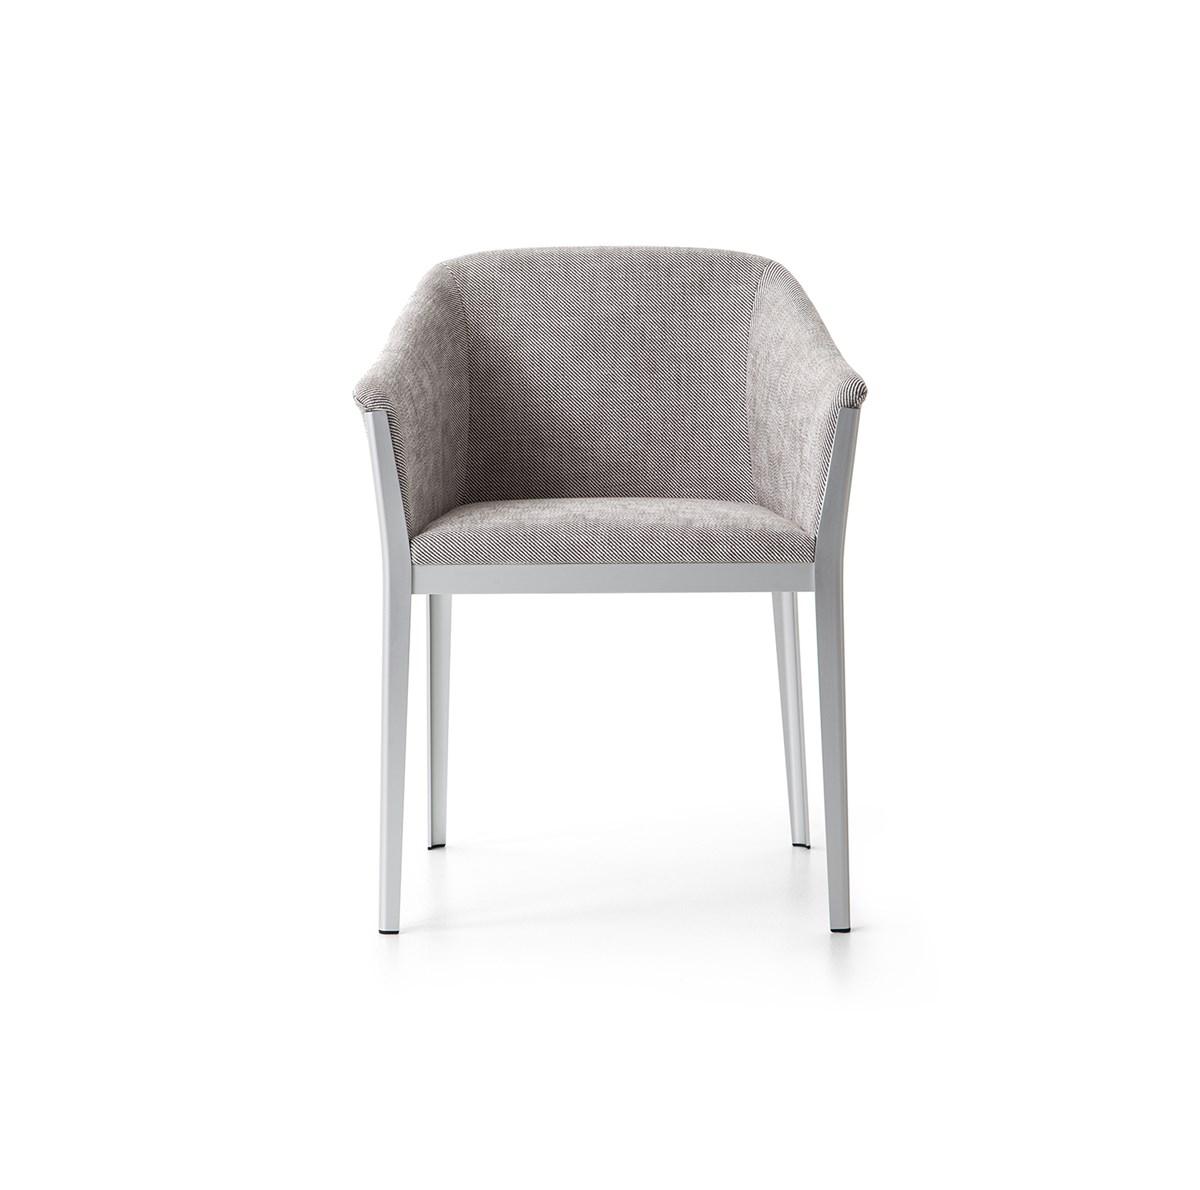 Cassina-Ronan-Erwan-Bouroullec-Cotone-Armchair-Matisse-2